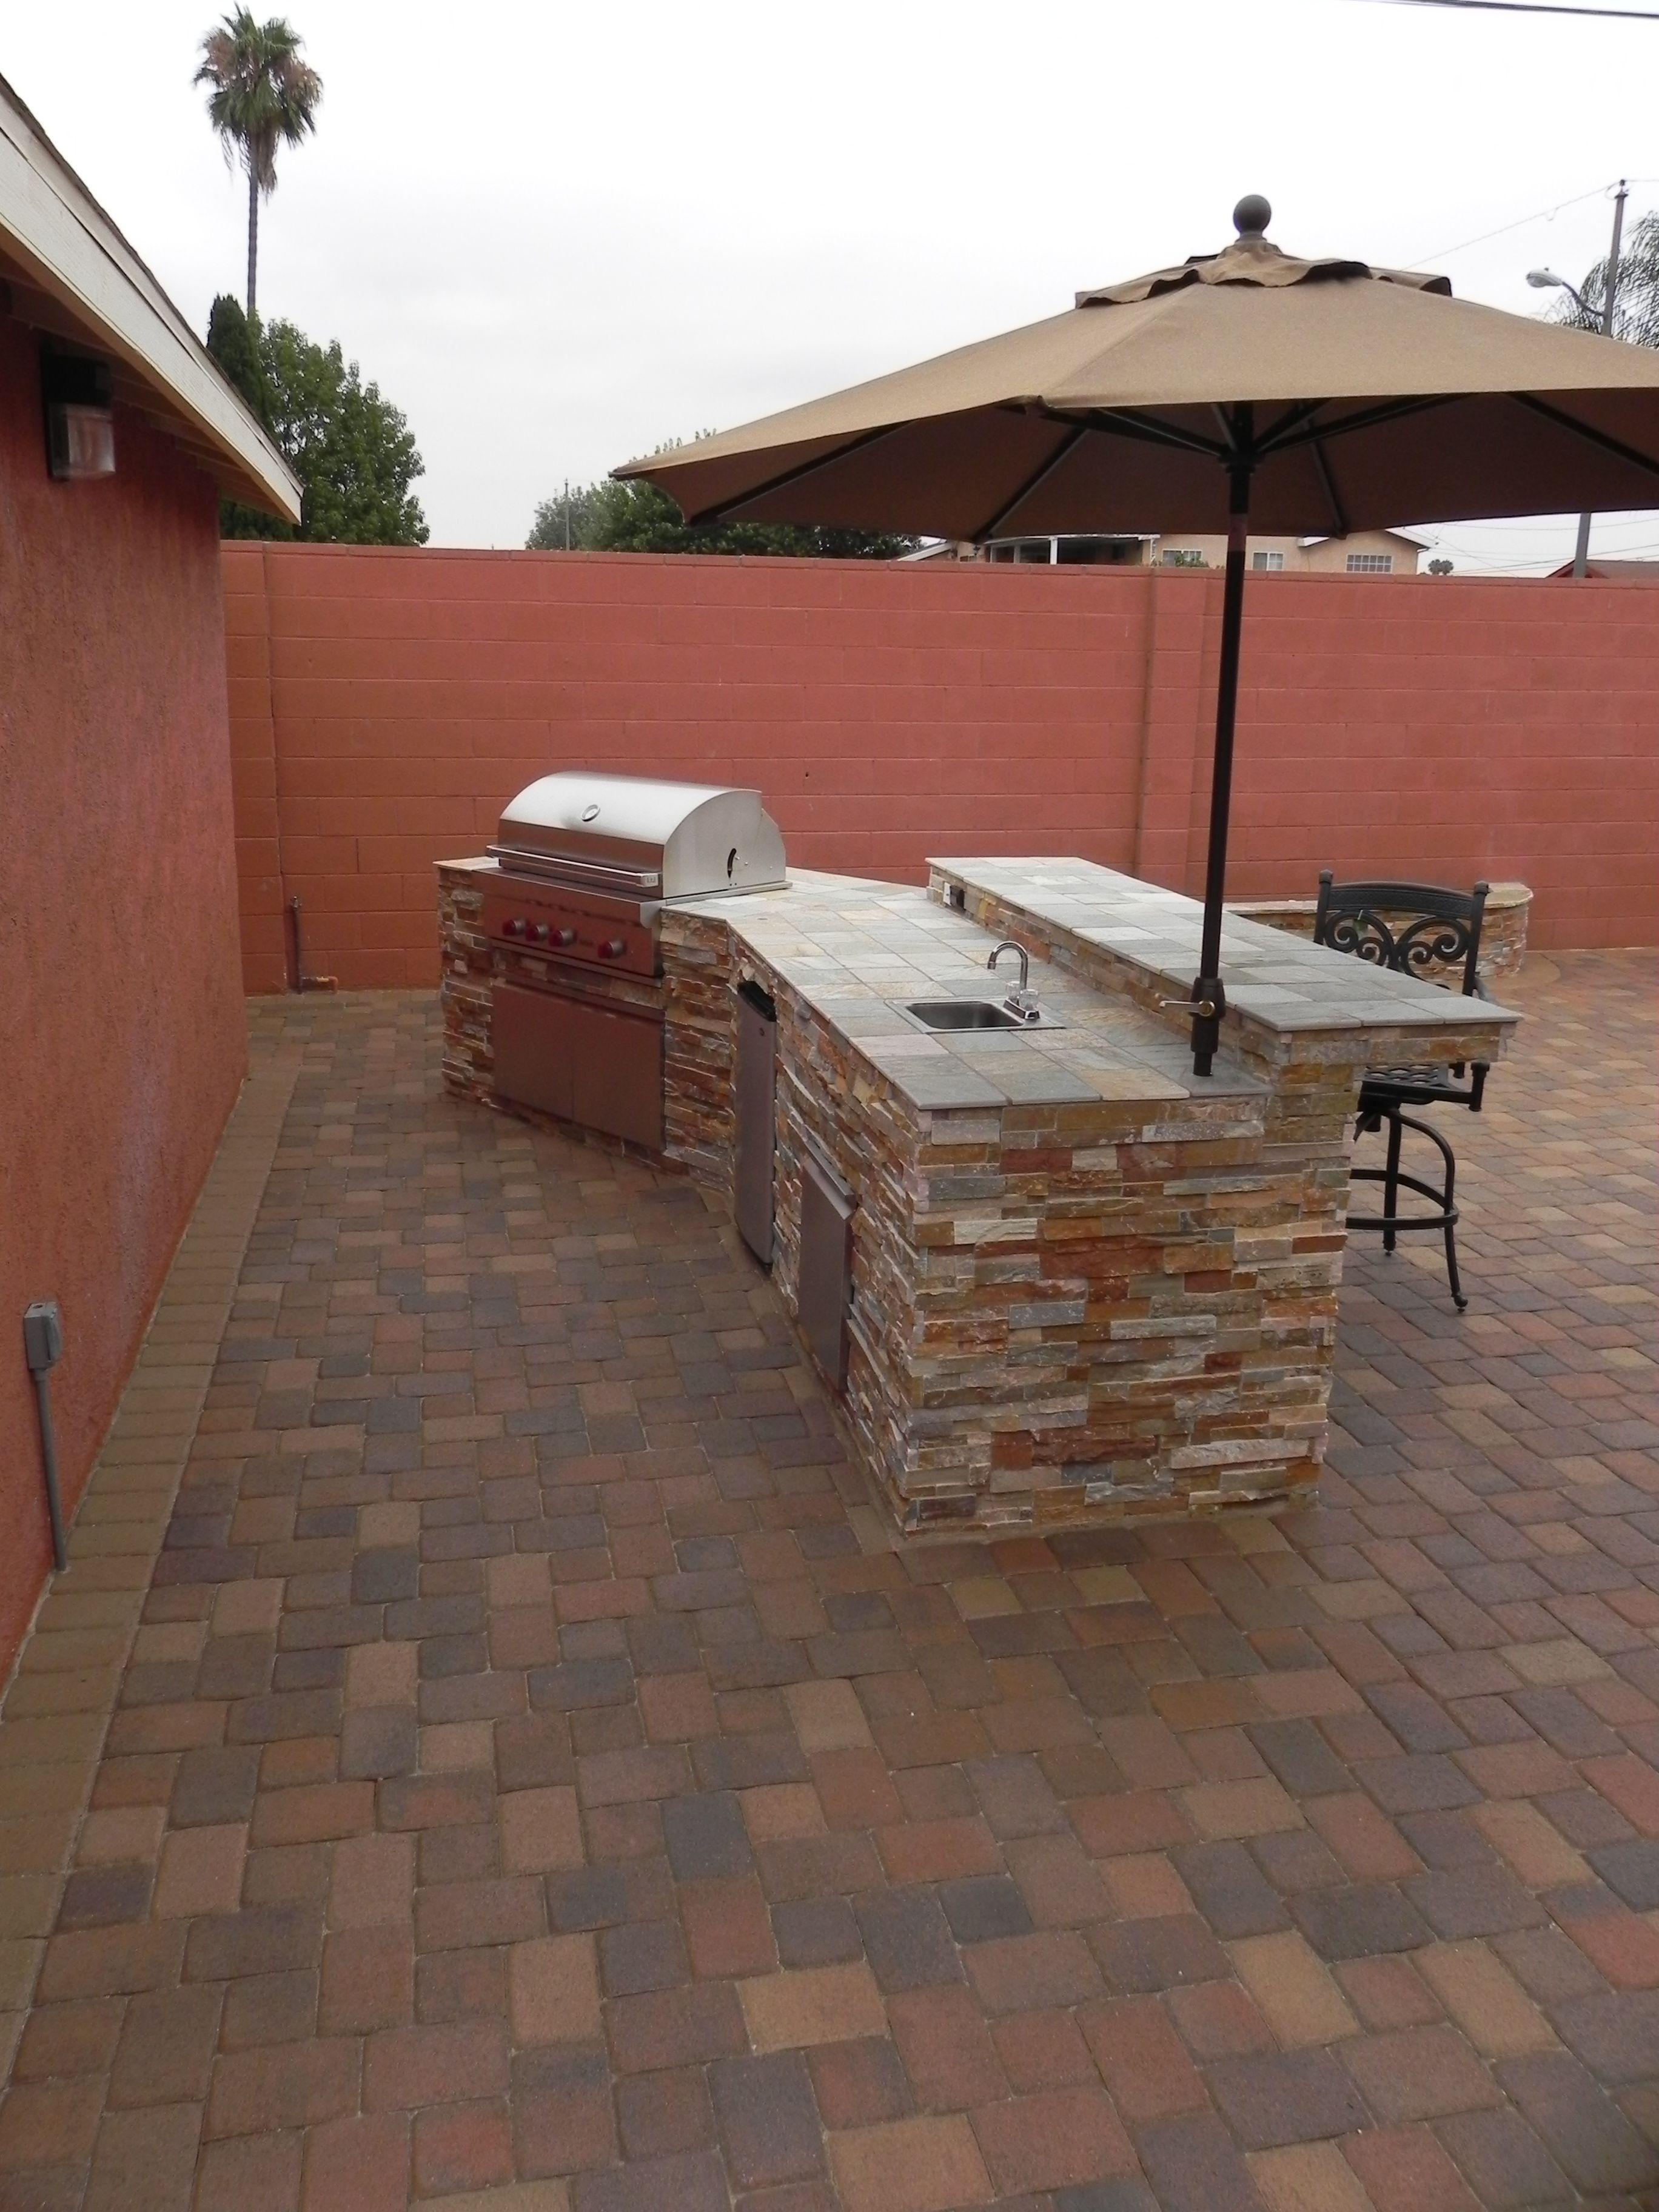 New patio and BBQ island | Outdoor kitchen island, Outdoor ... on Backyard Patio Grill Island id=95141